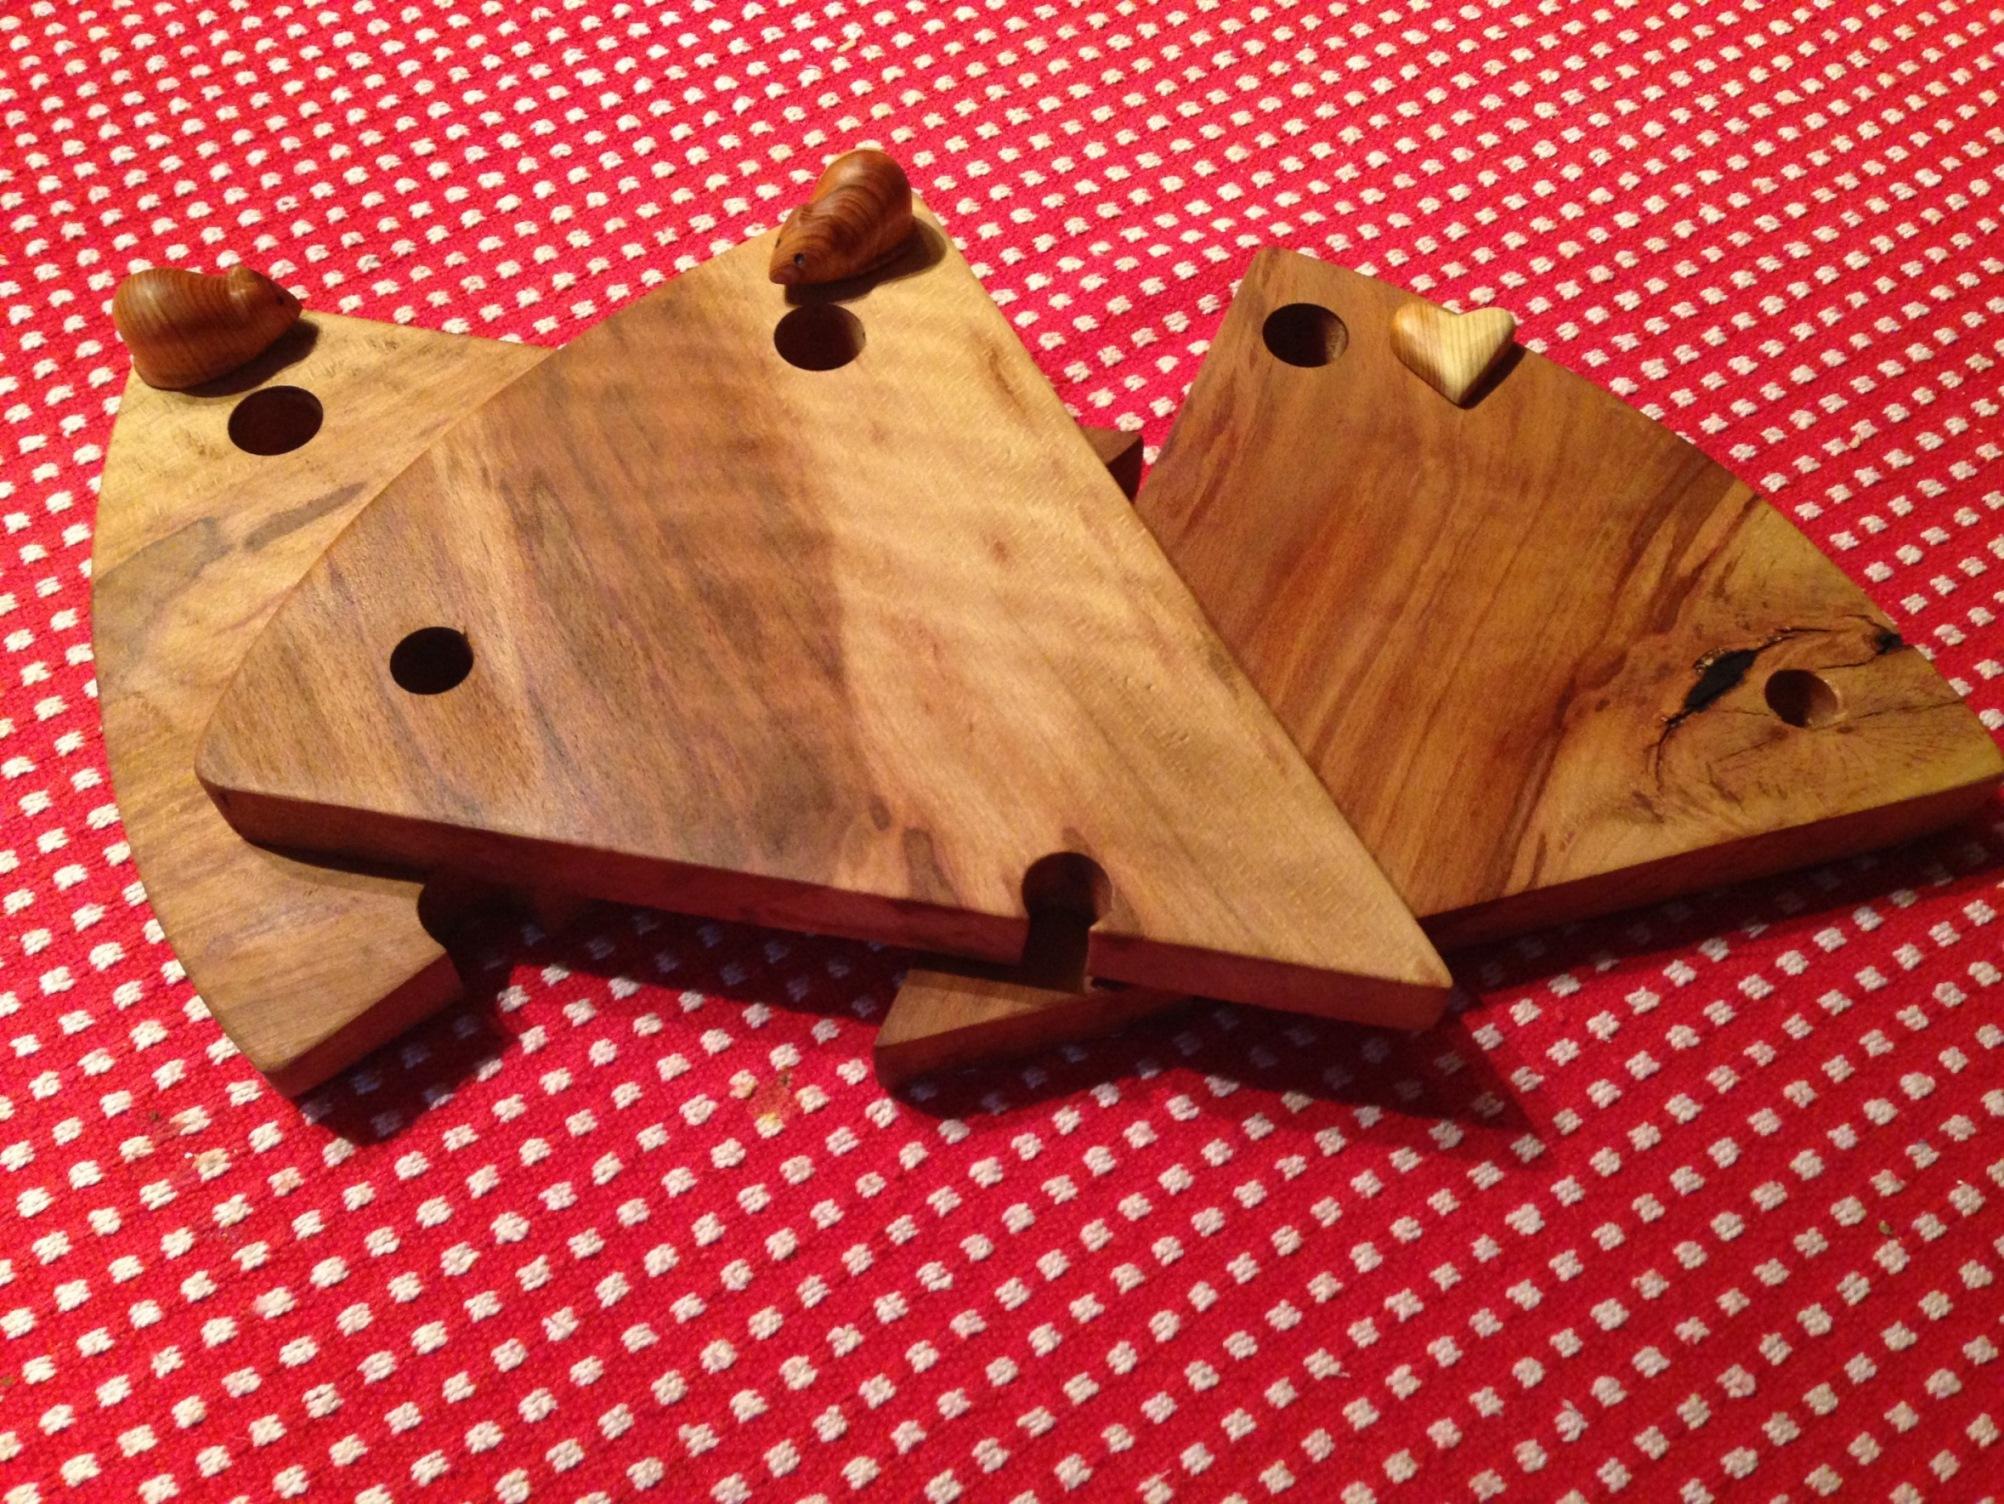 20150417 Cheese Boards (1).JPG